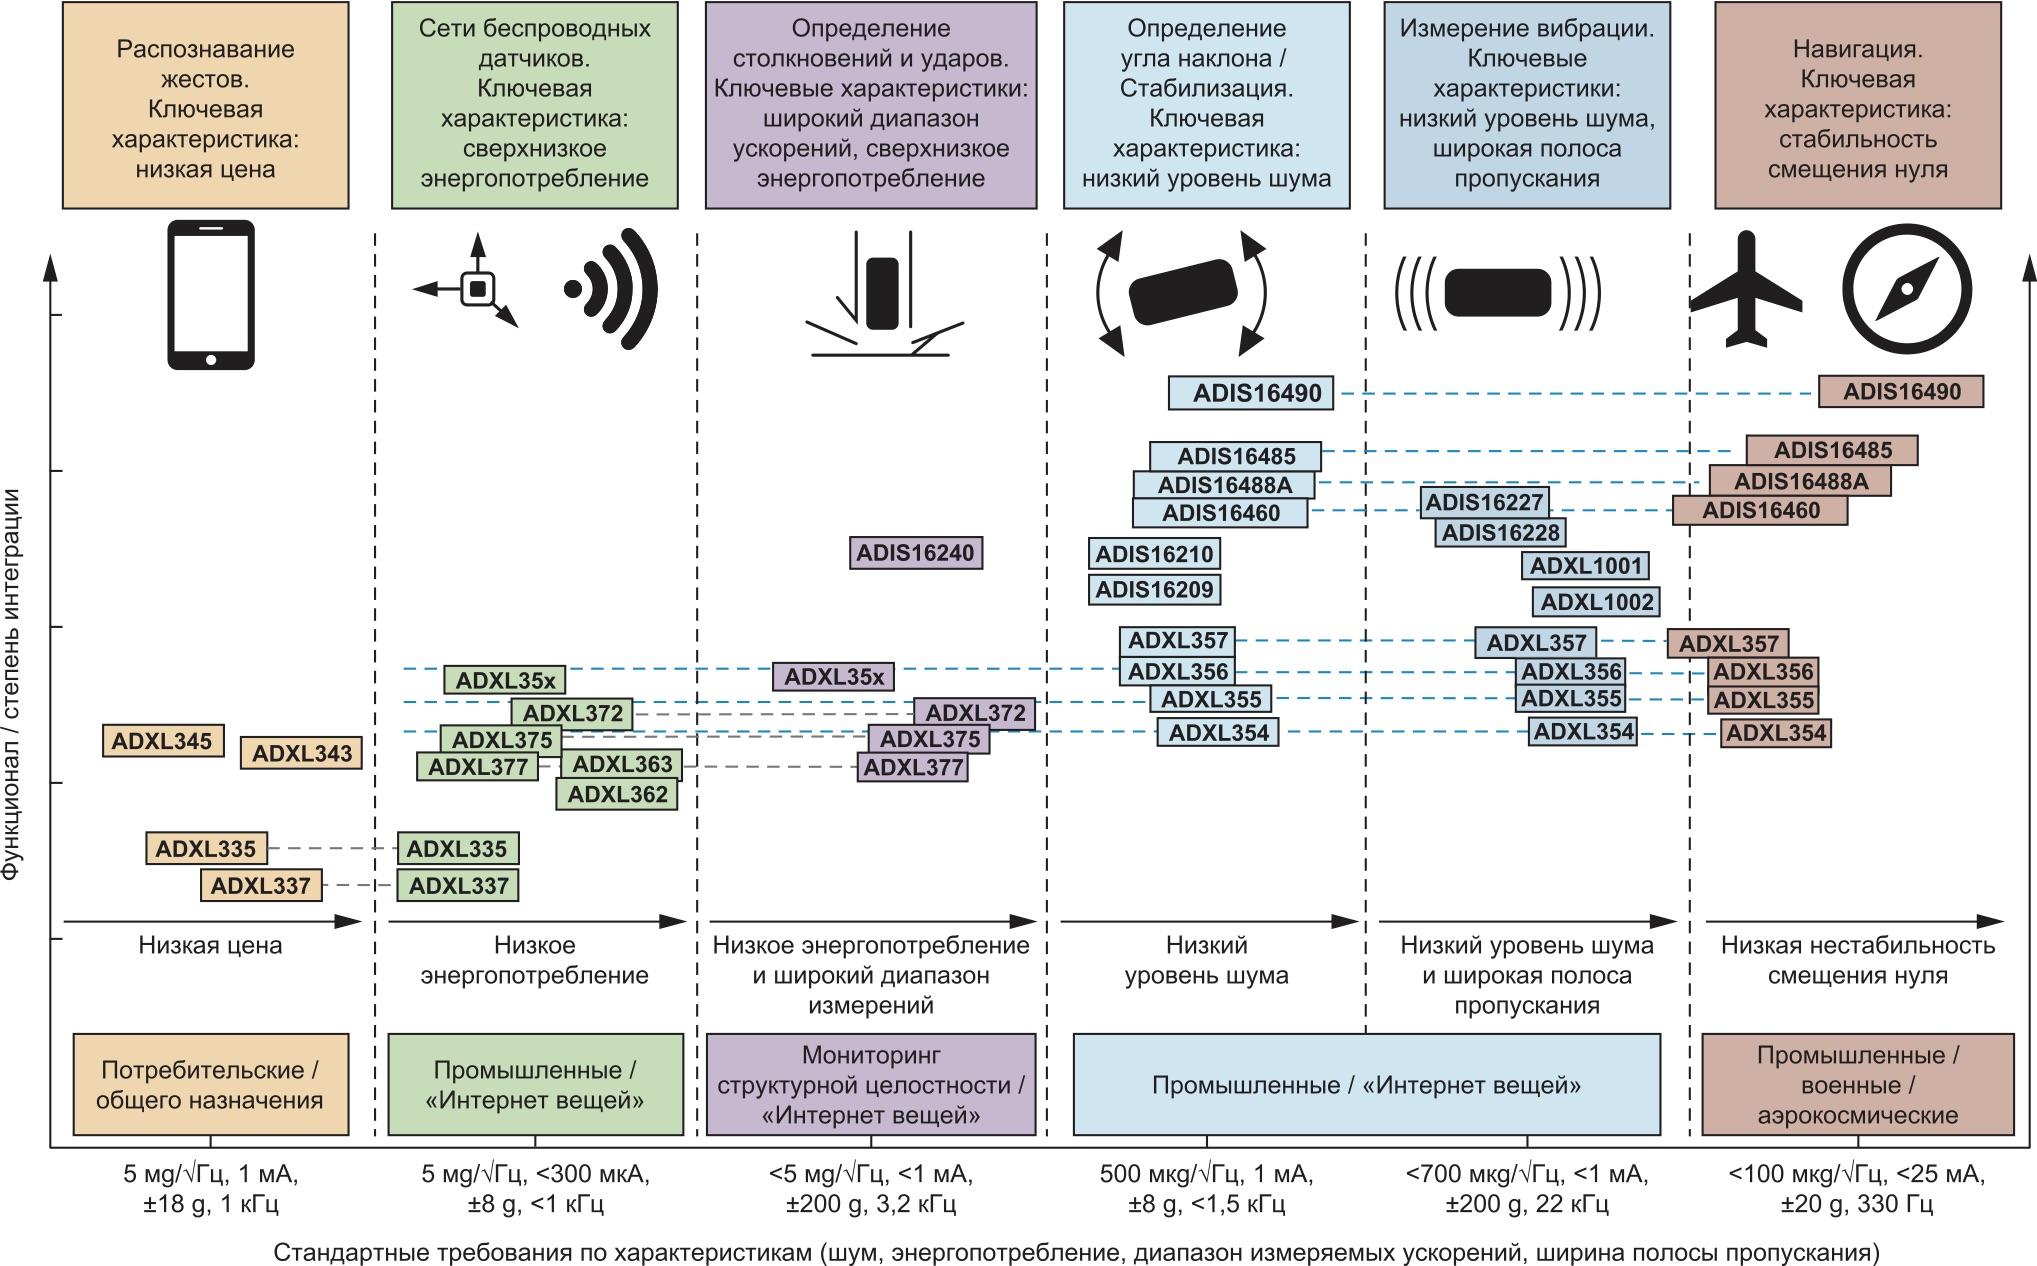 Области применения МЭМС-акселерометров Analog Devices